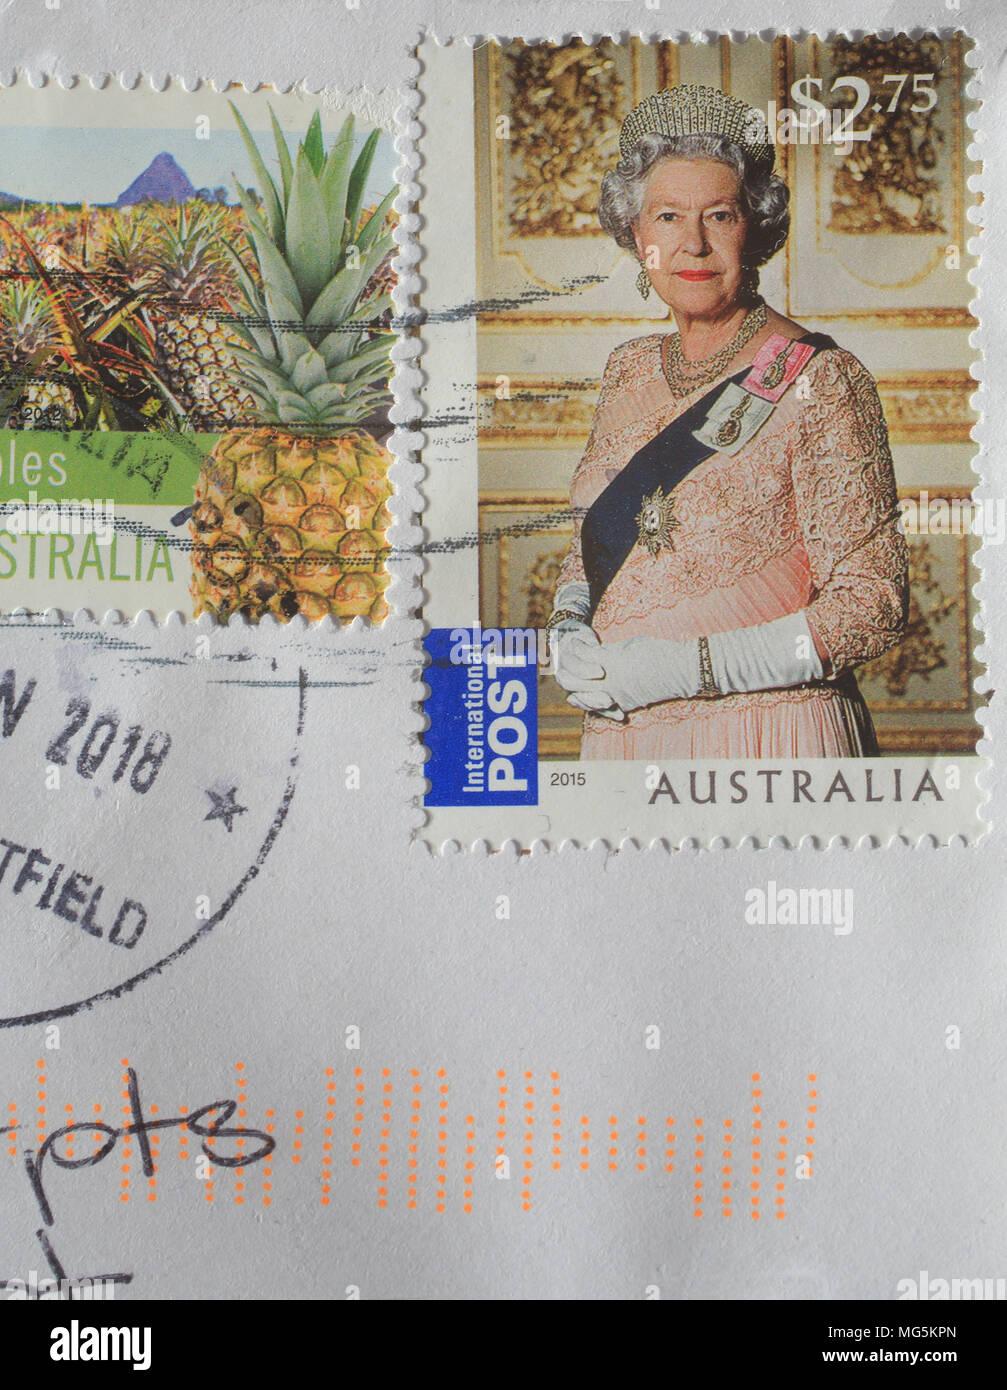 Queen Elizabeth II on Australian stamps, for international post. - Stock Image